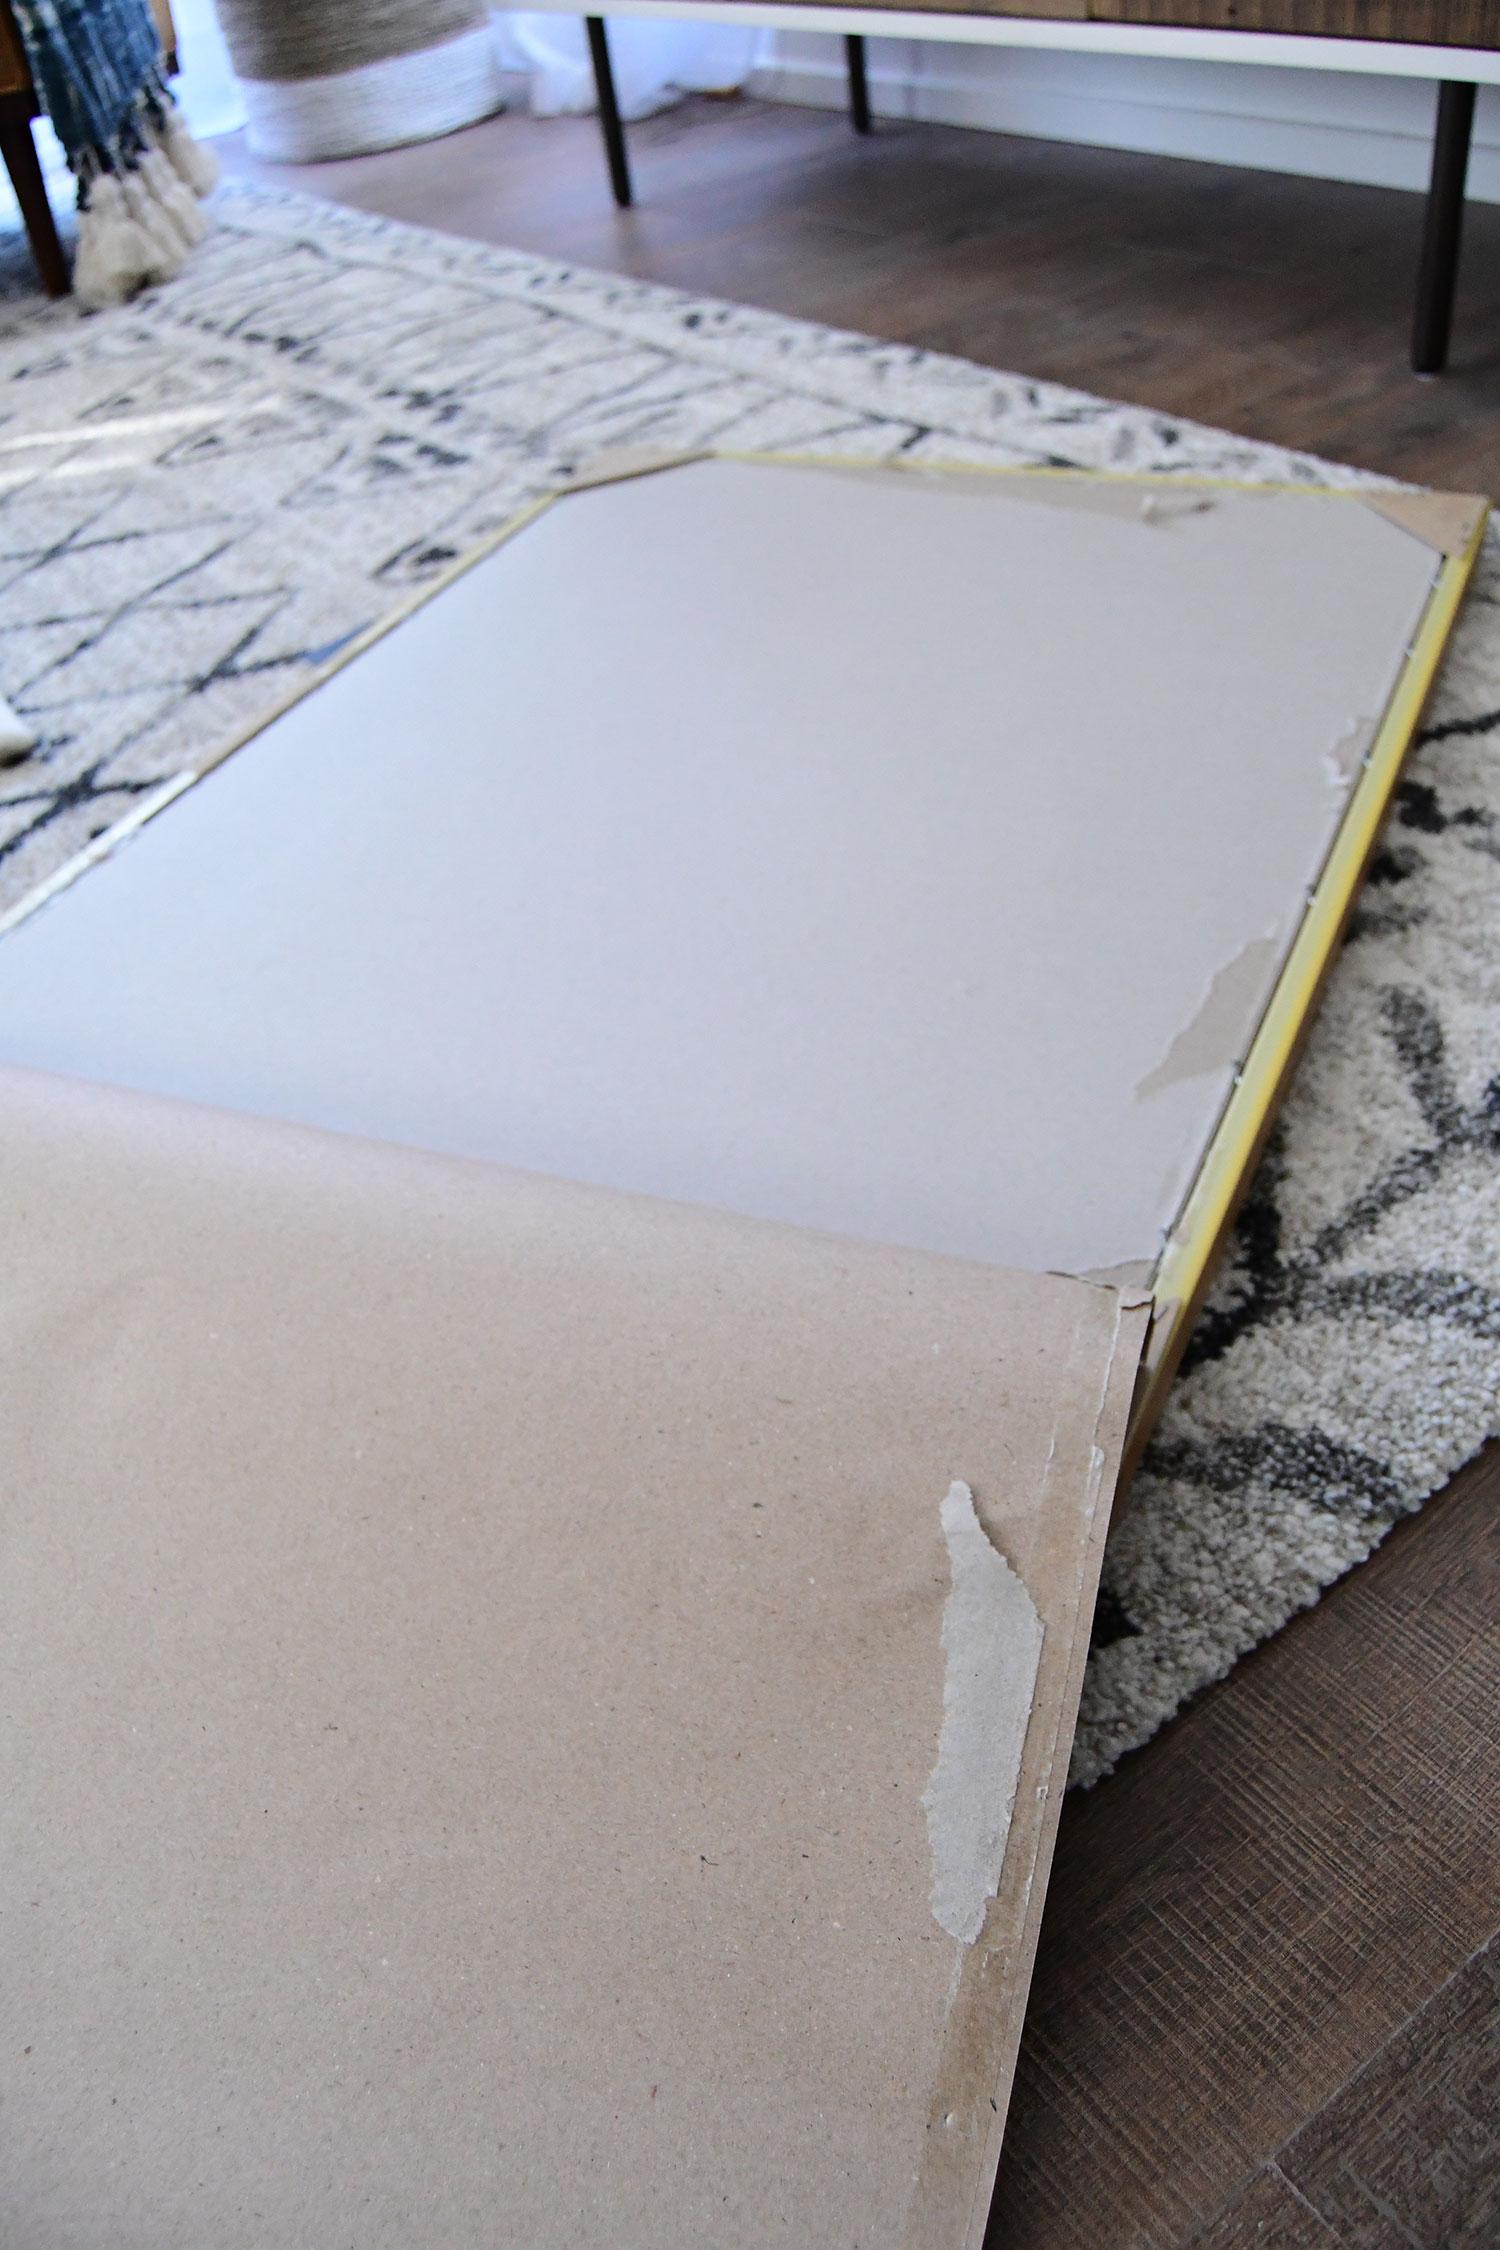 087435ef0ec9 How to frame big art on a small budget no building involved jpg 1500x2250  Target diy